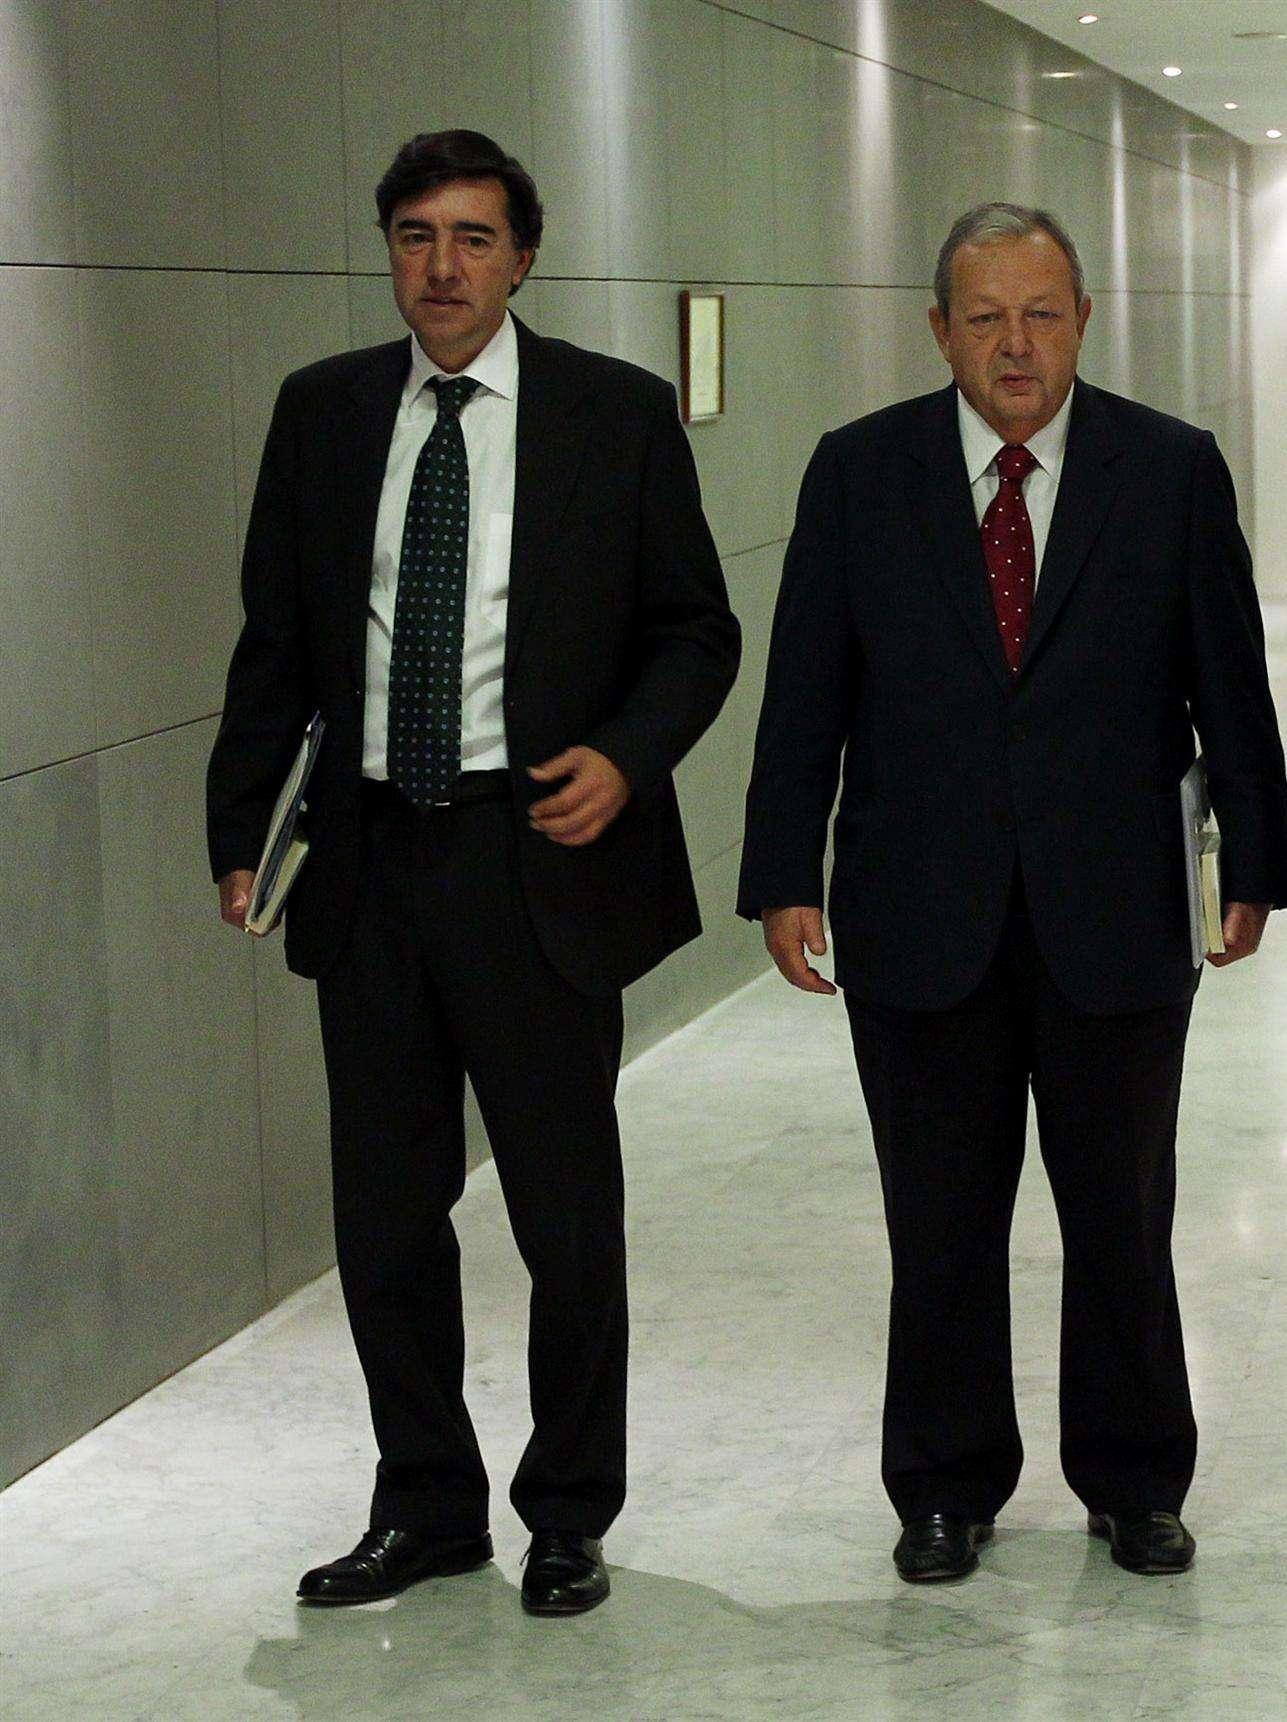 José Antonio Bermúdez de Castro y Txiki Benegas Foto: EUROPA PRESS